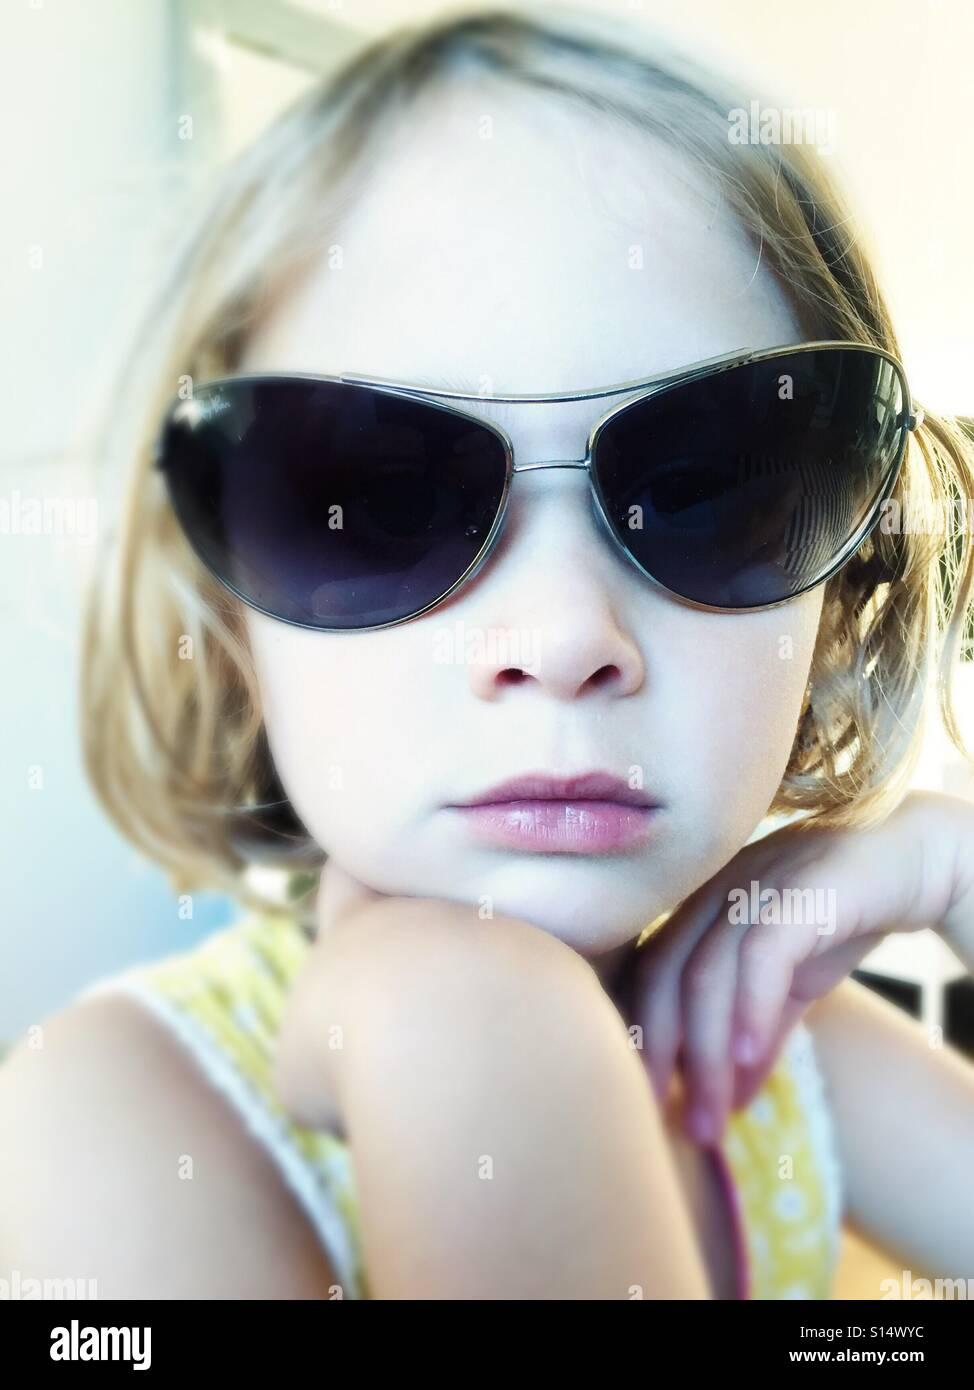 Got those sun glasses - Stock Image